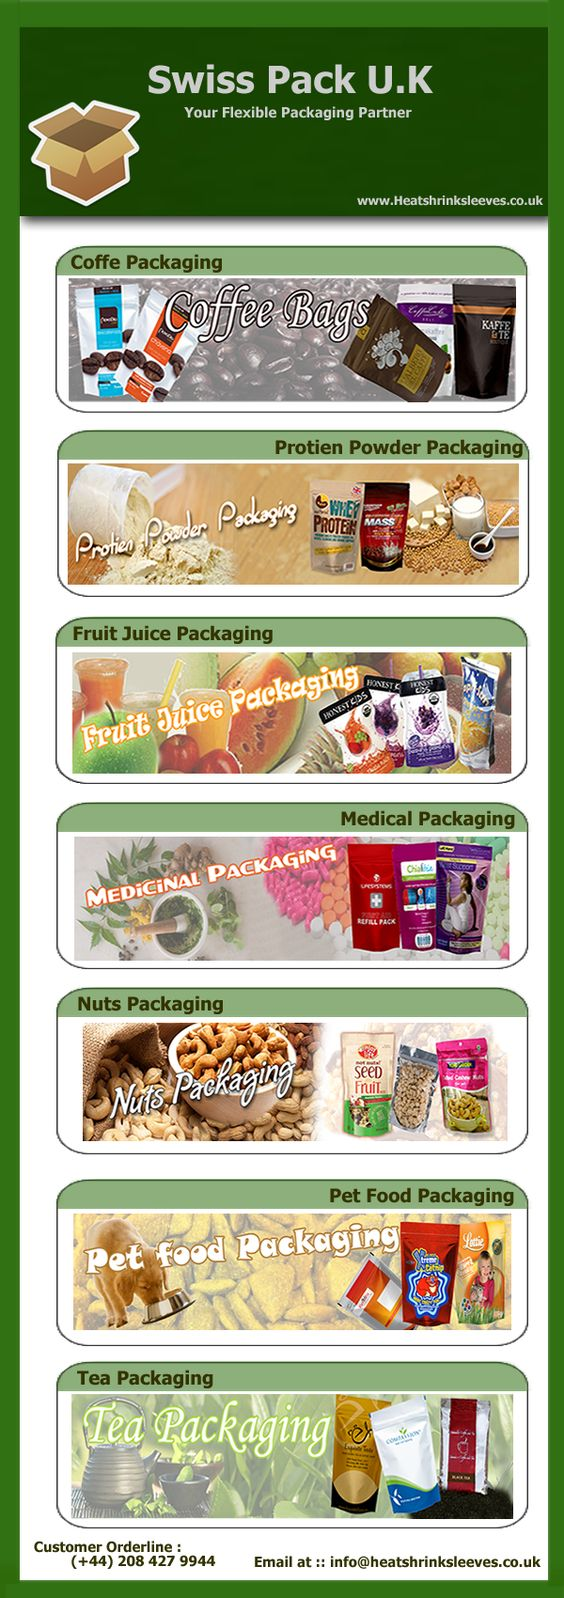 Swiss #Pack #UK - Your #Flexible #Packaging Partner